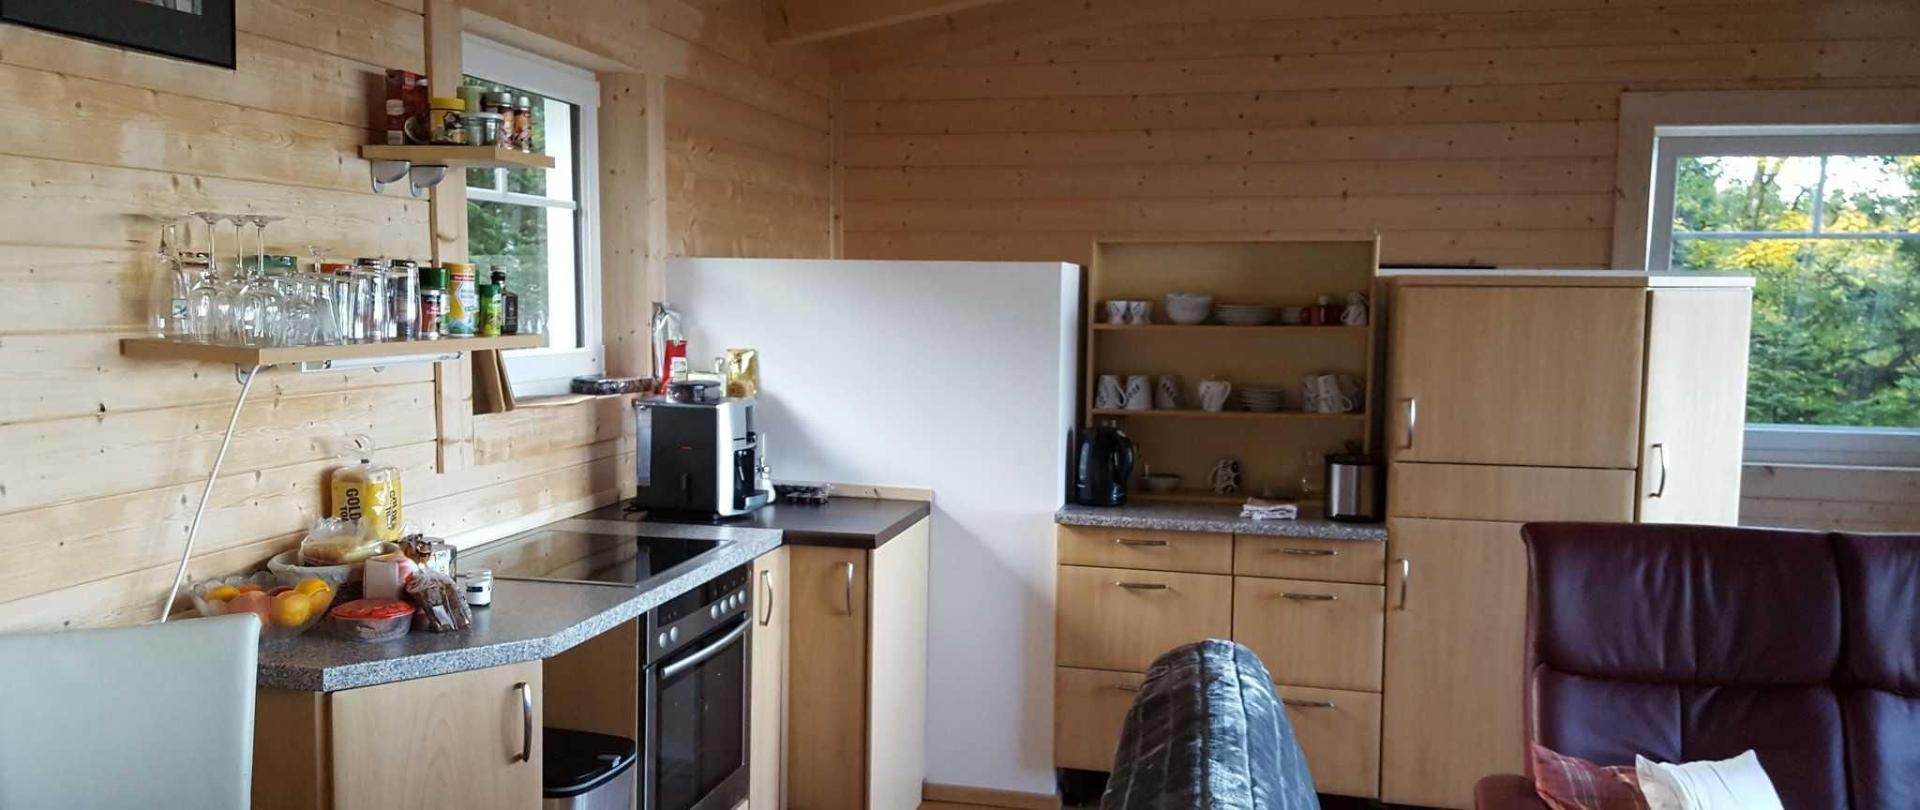 kitchen at lake view suite